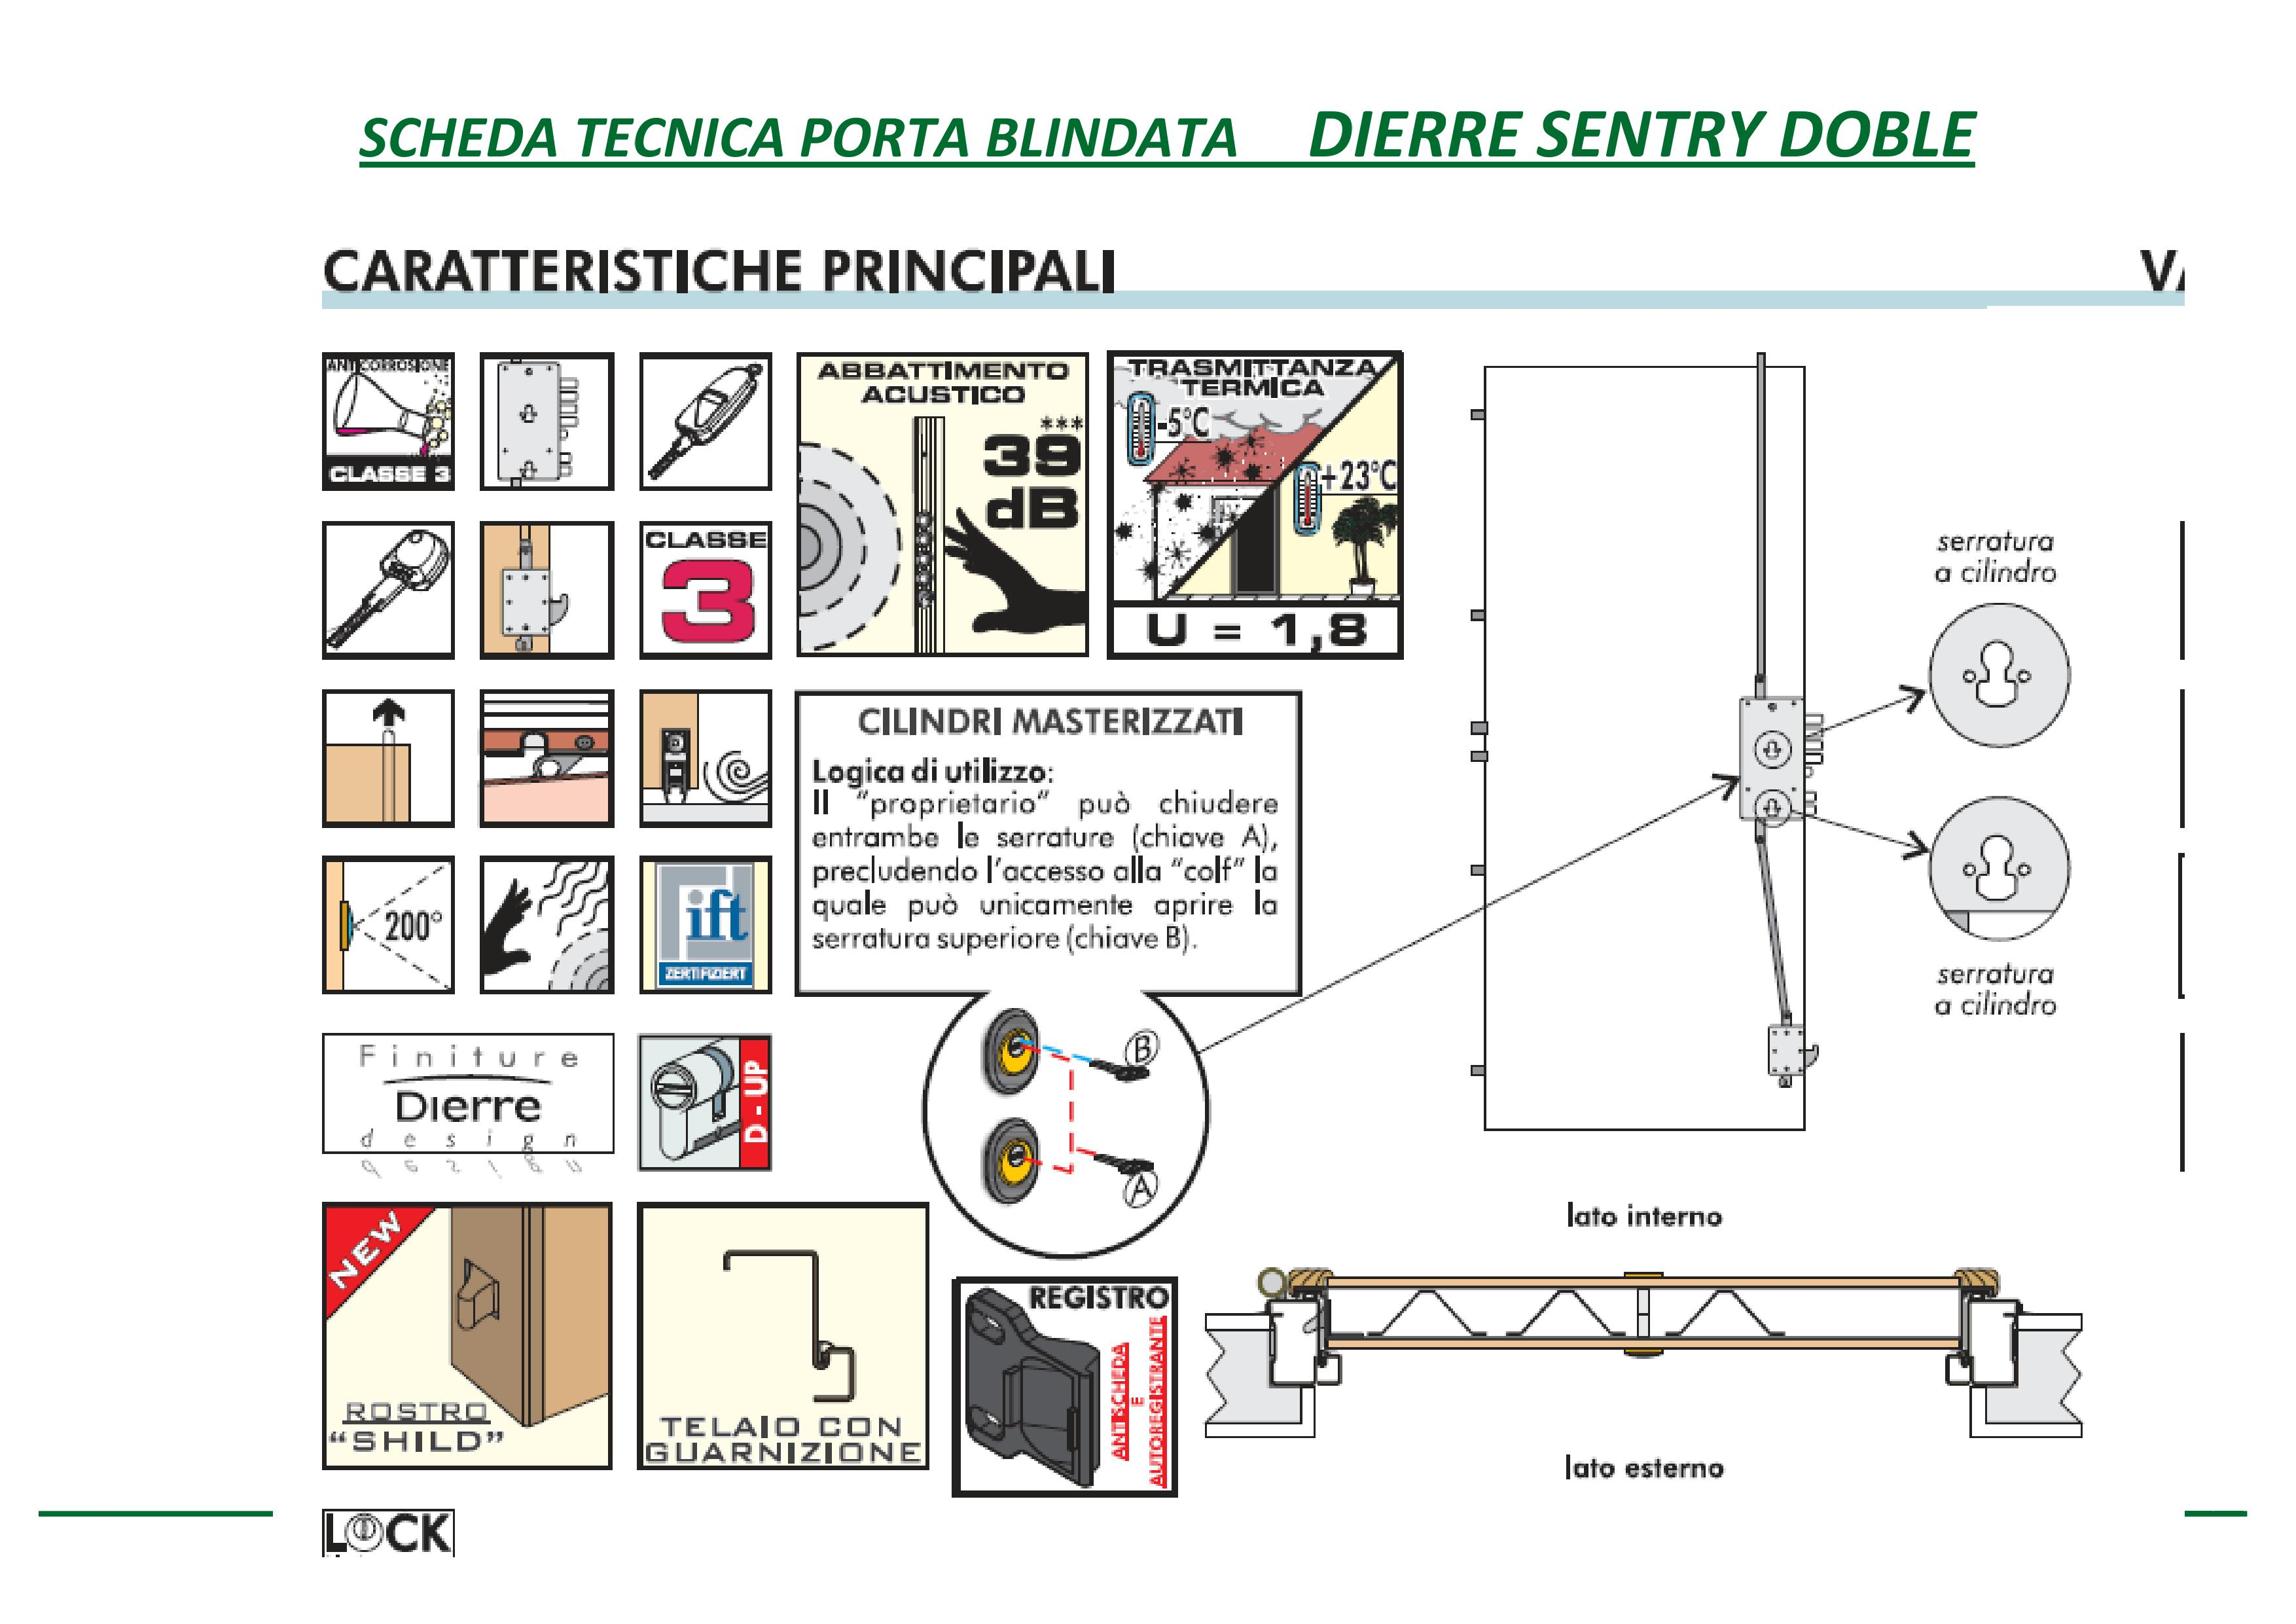 Tirelli porte porte milano dorica castelli dierre - Porta blindata dierre classe 3 ...